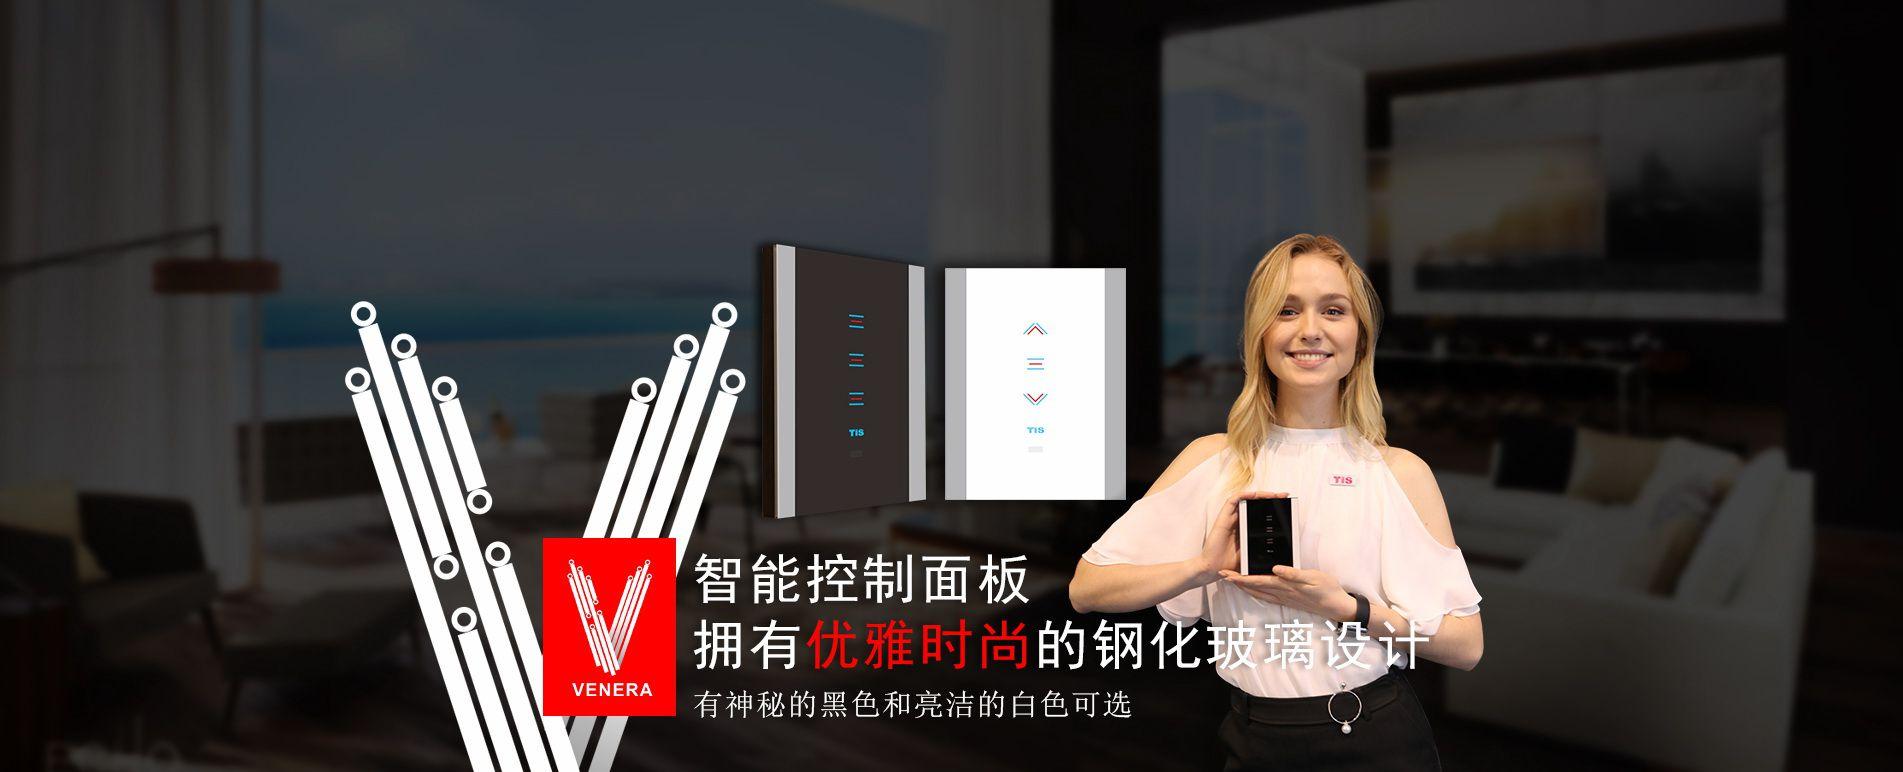 TIS科技 - Venera智能无线照明开关